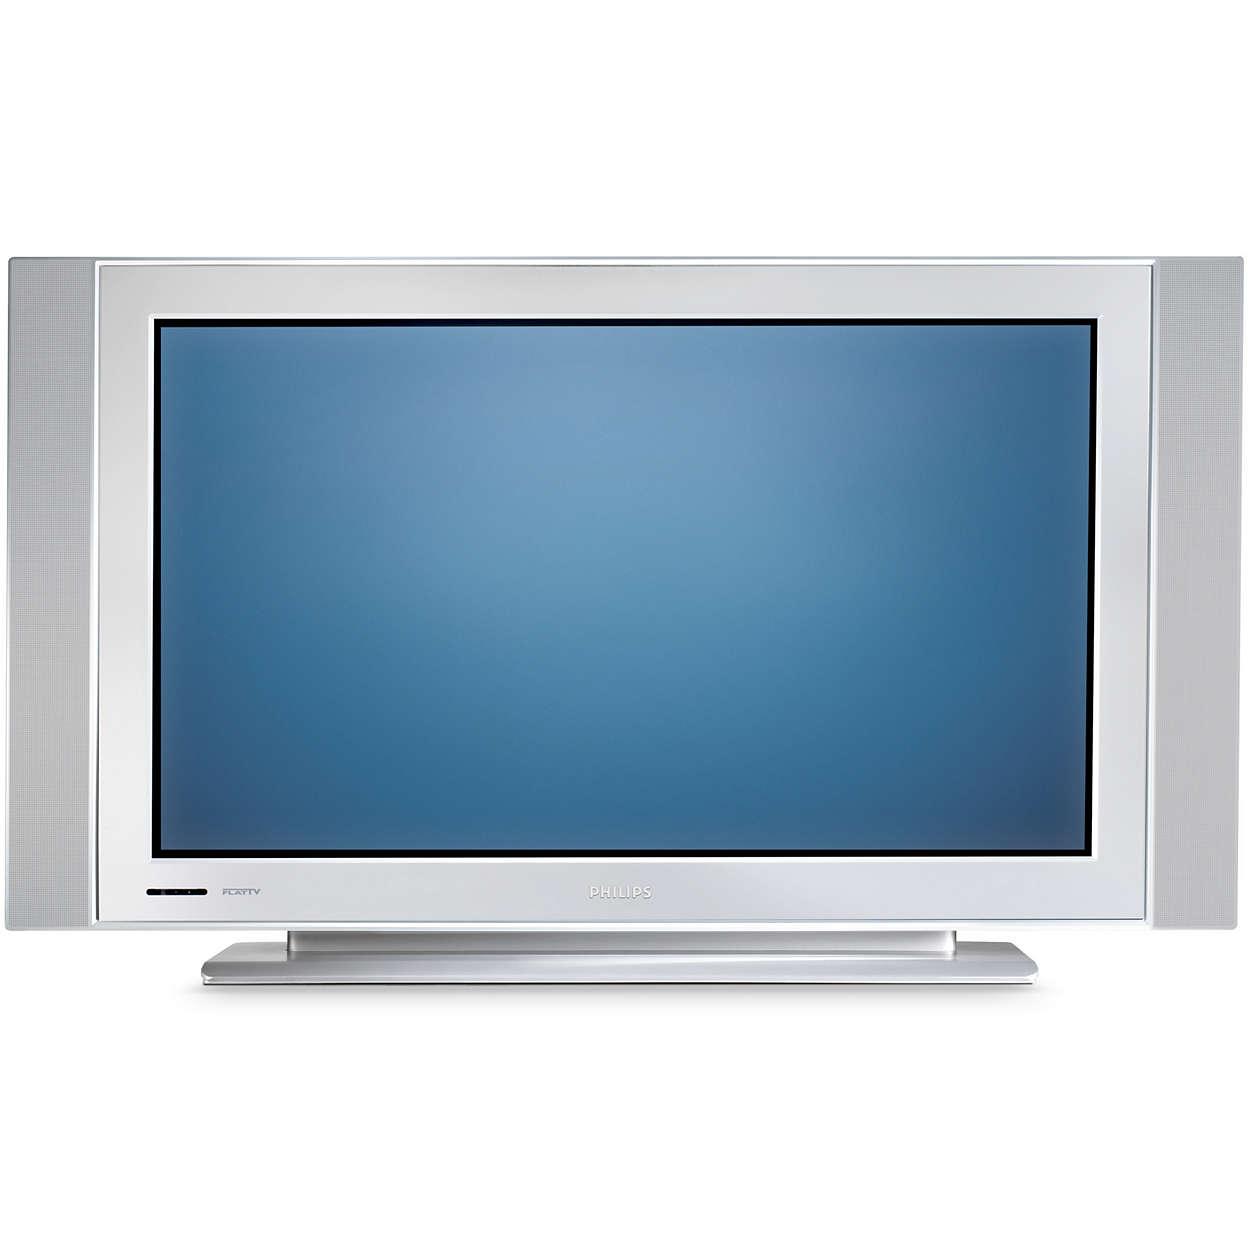 proscan 50 inch led tv manual